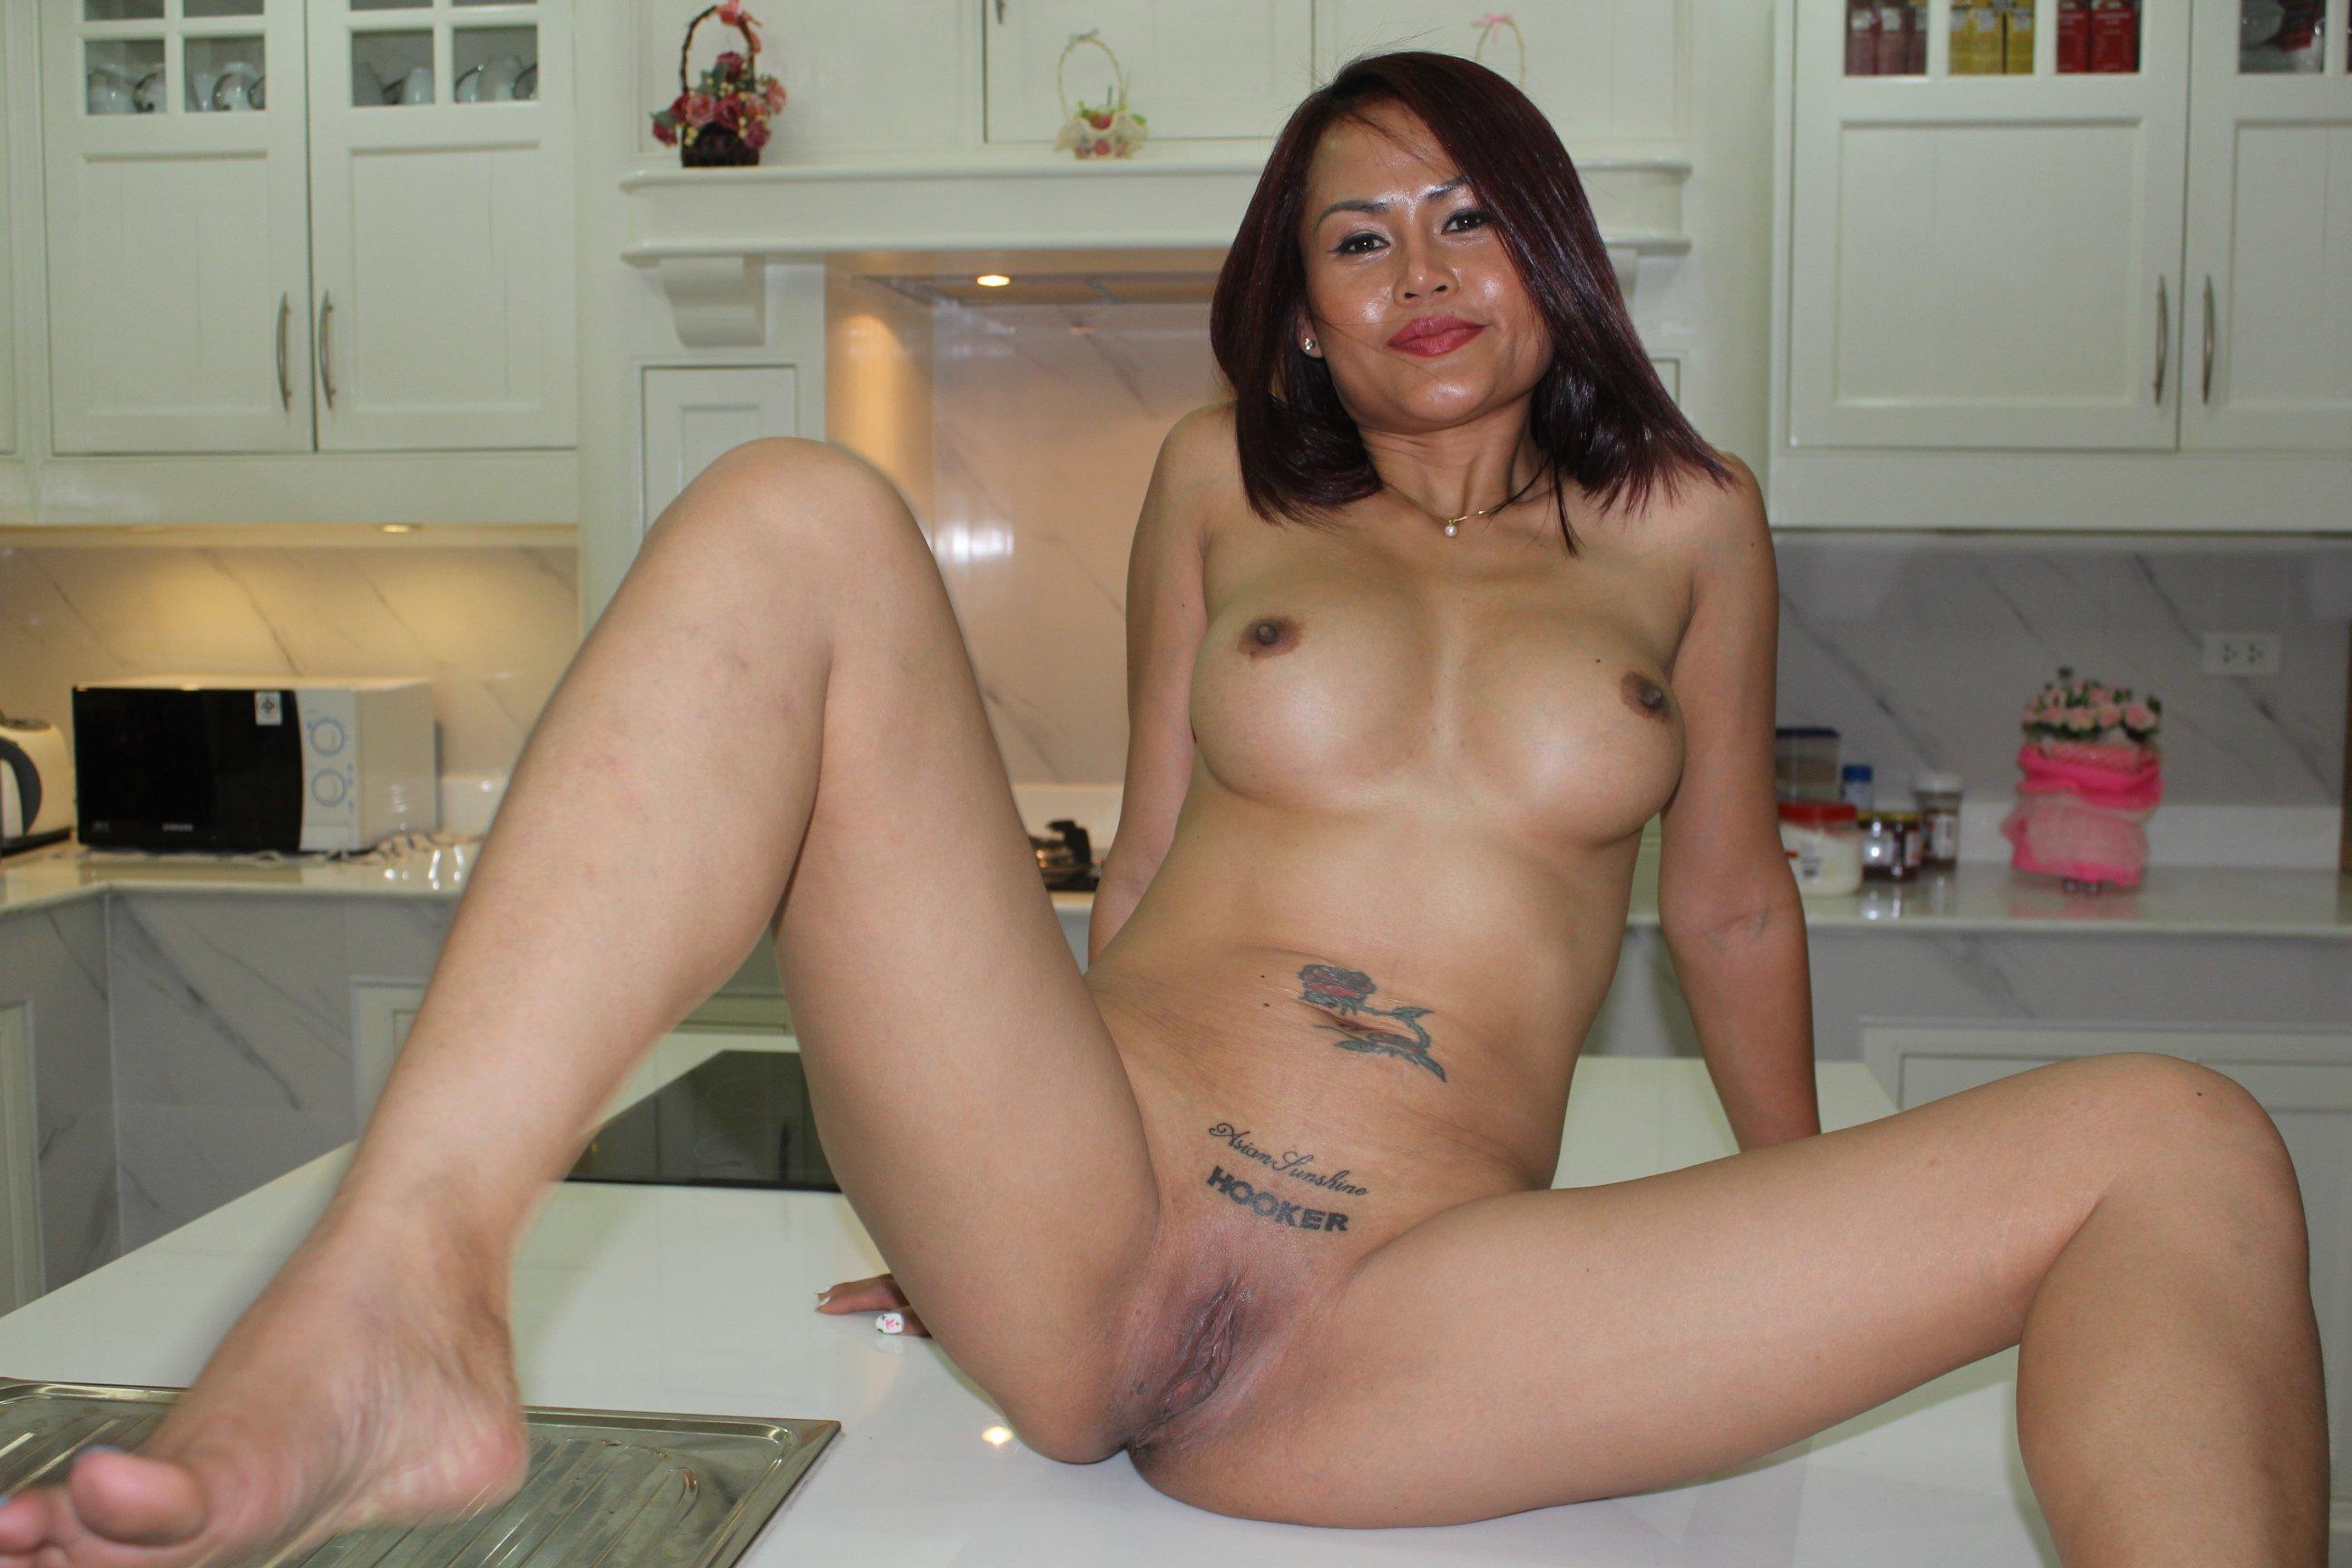 Ginger jolie porn star